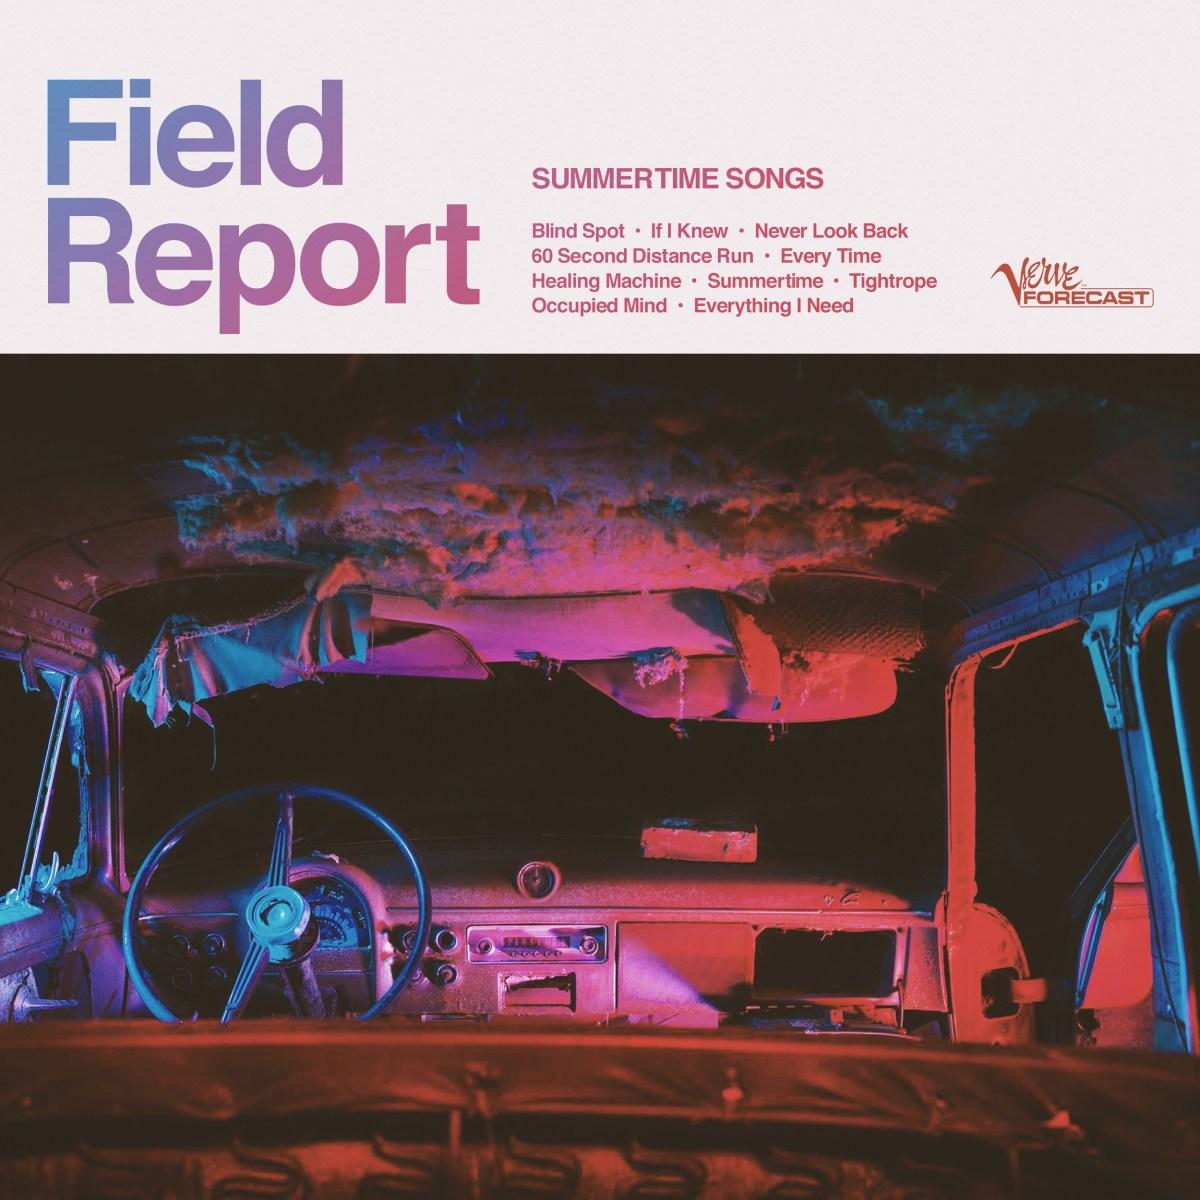 Field Report Summertime Songs album art